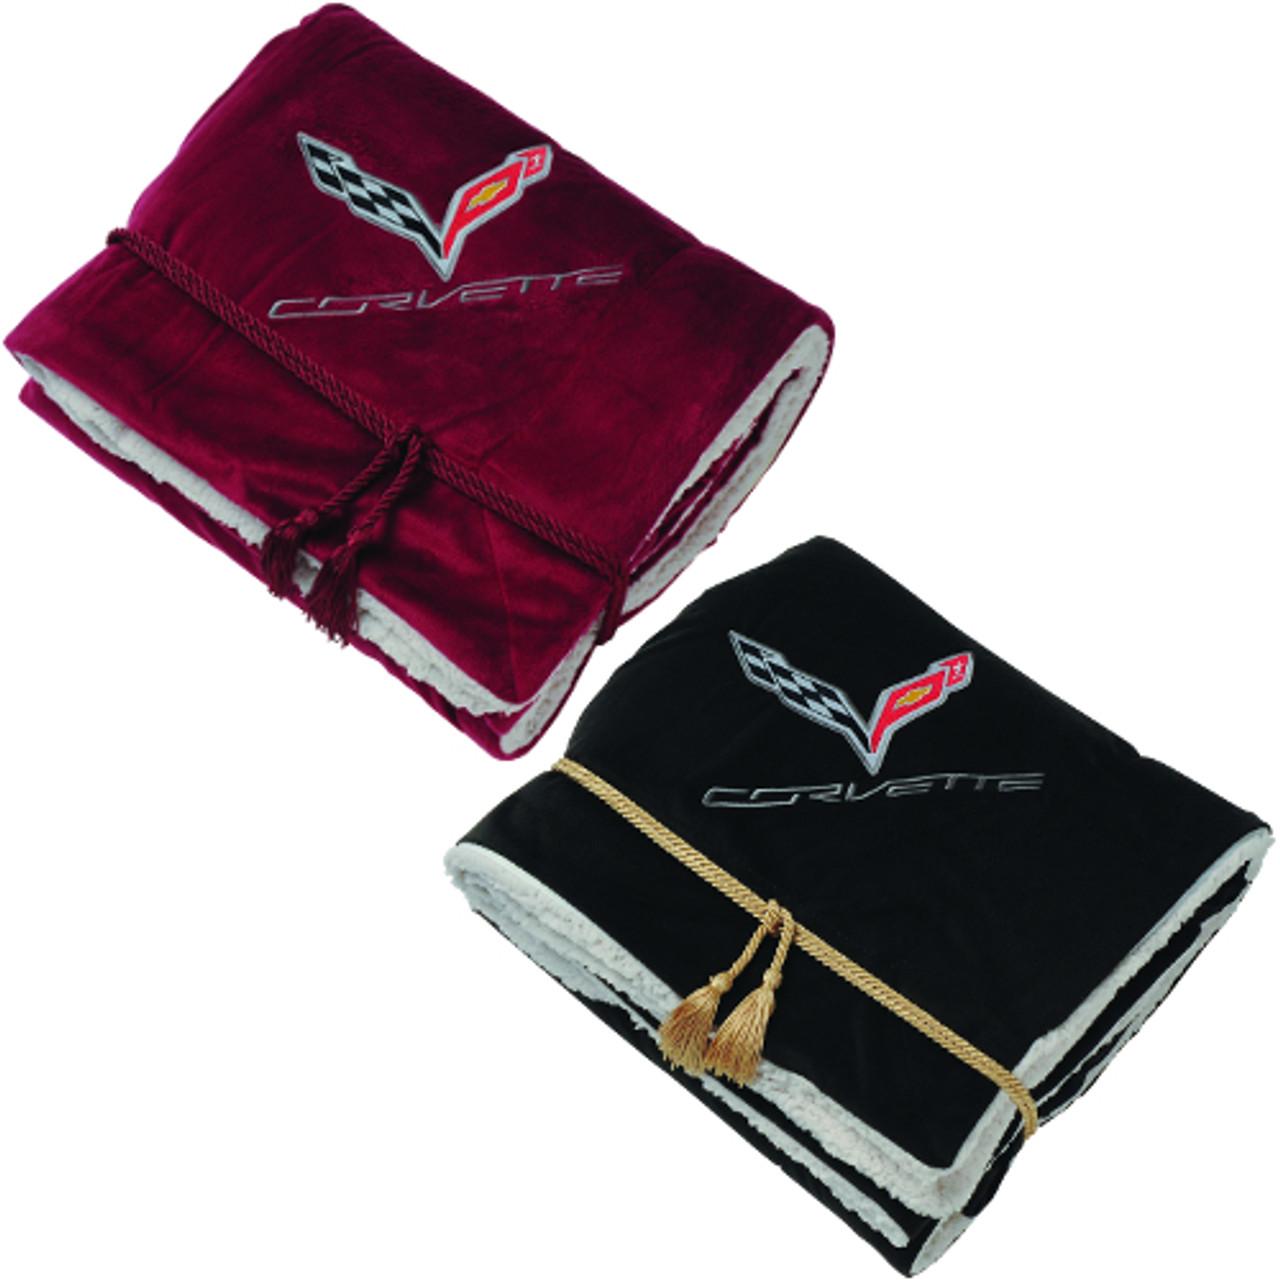 C7 Corvette Faux Lambs Wool Blanket